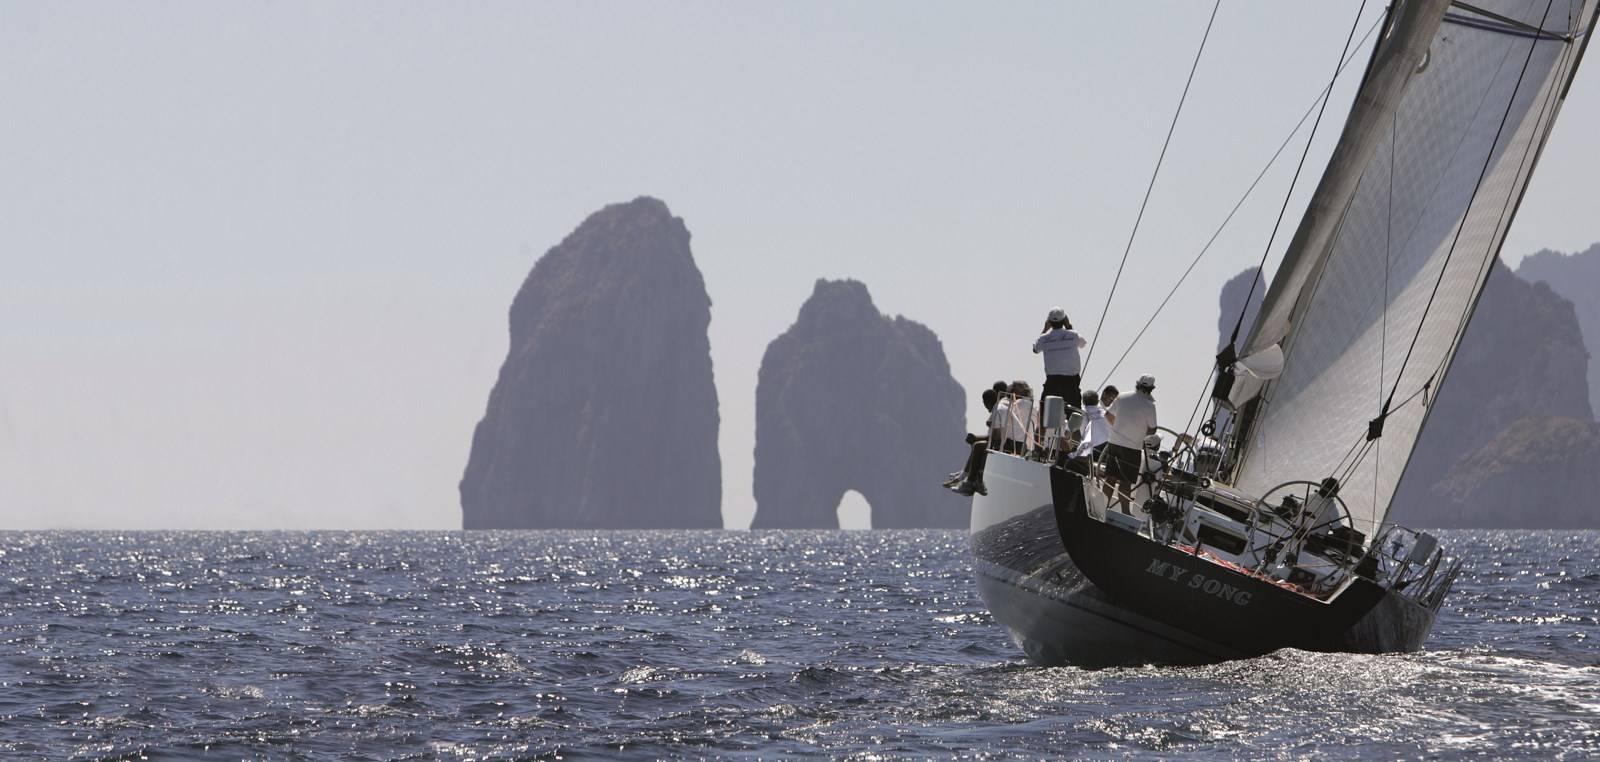 They return to Capri the Regatta of the Week of the Three Gulfs - Charme